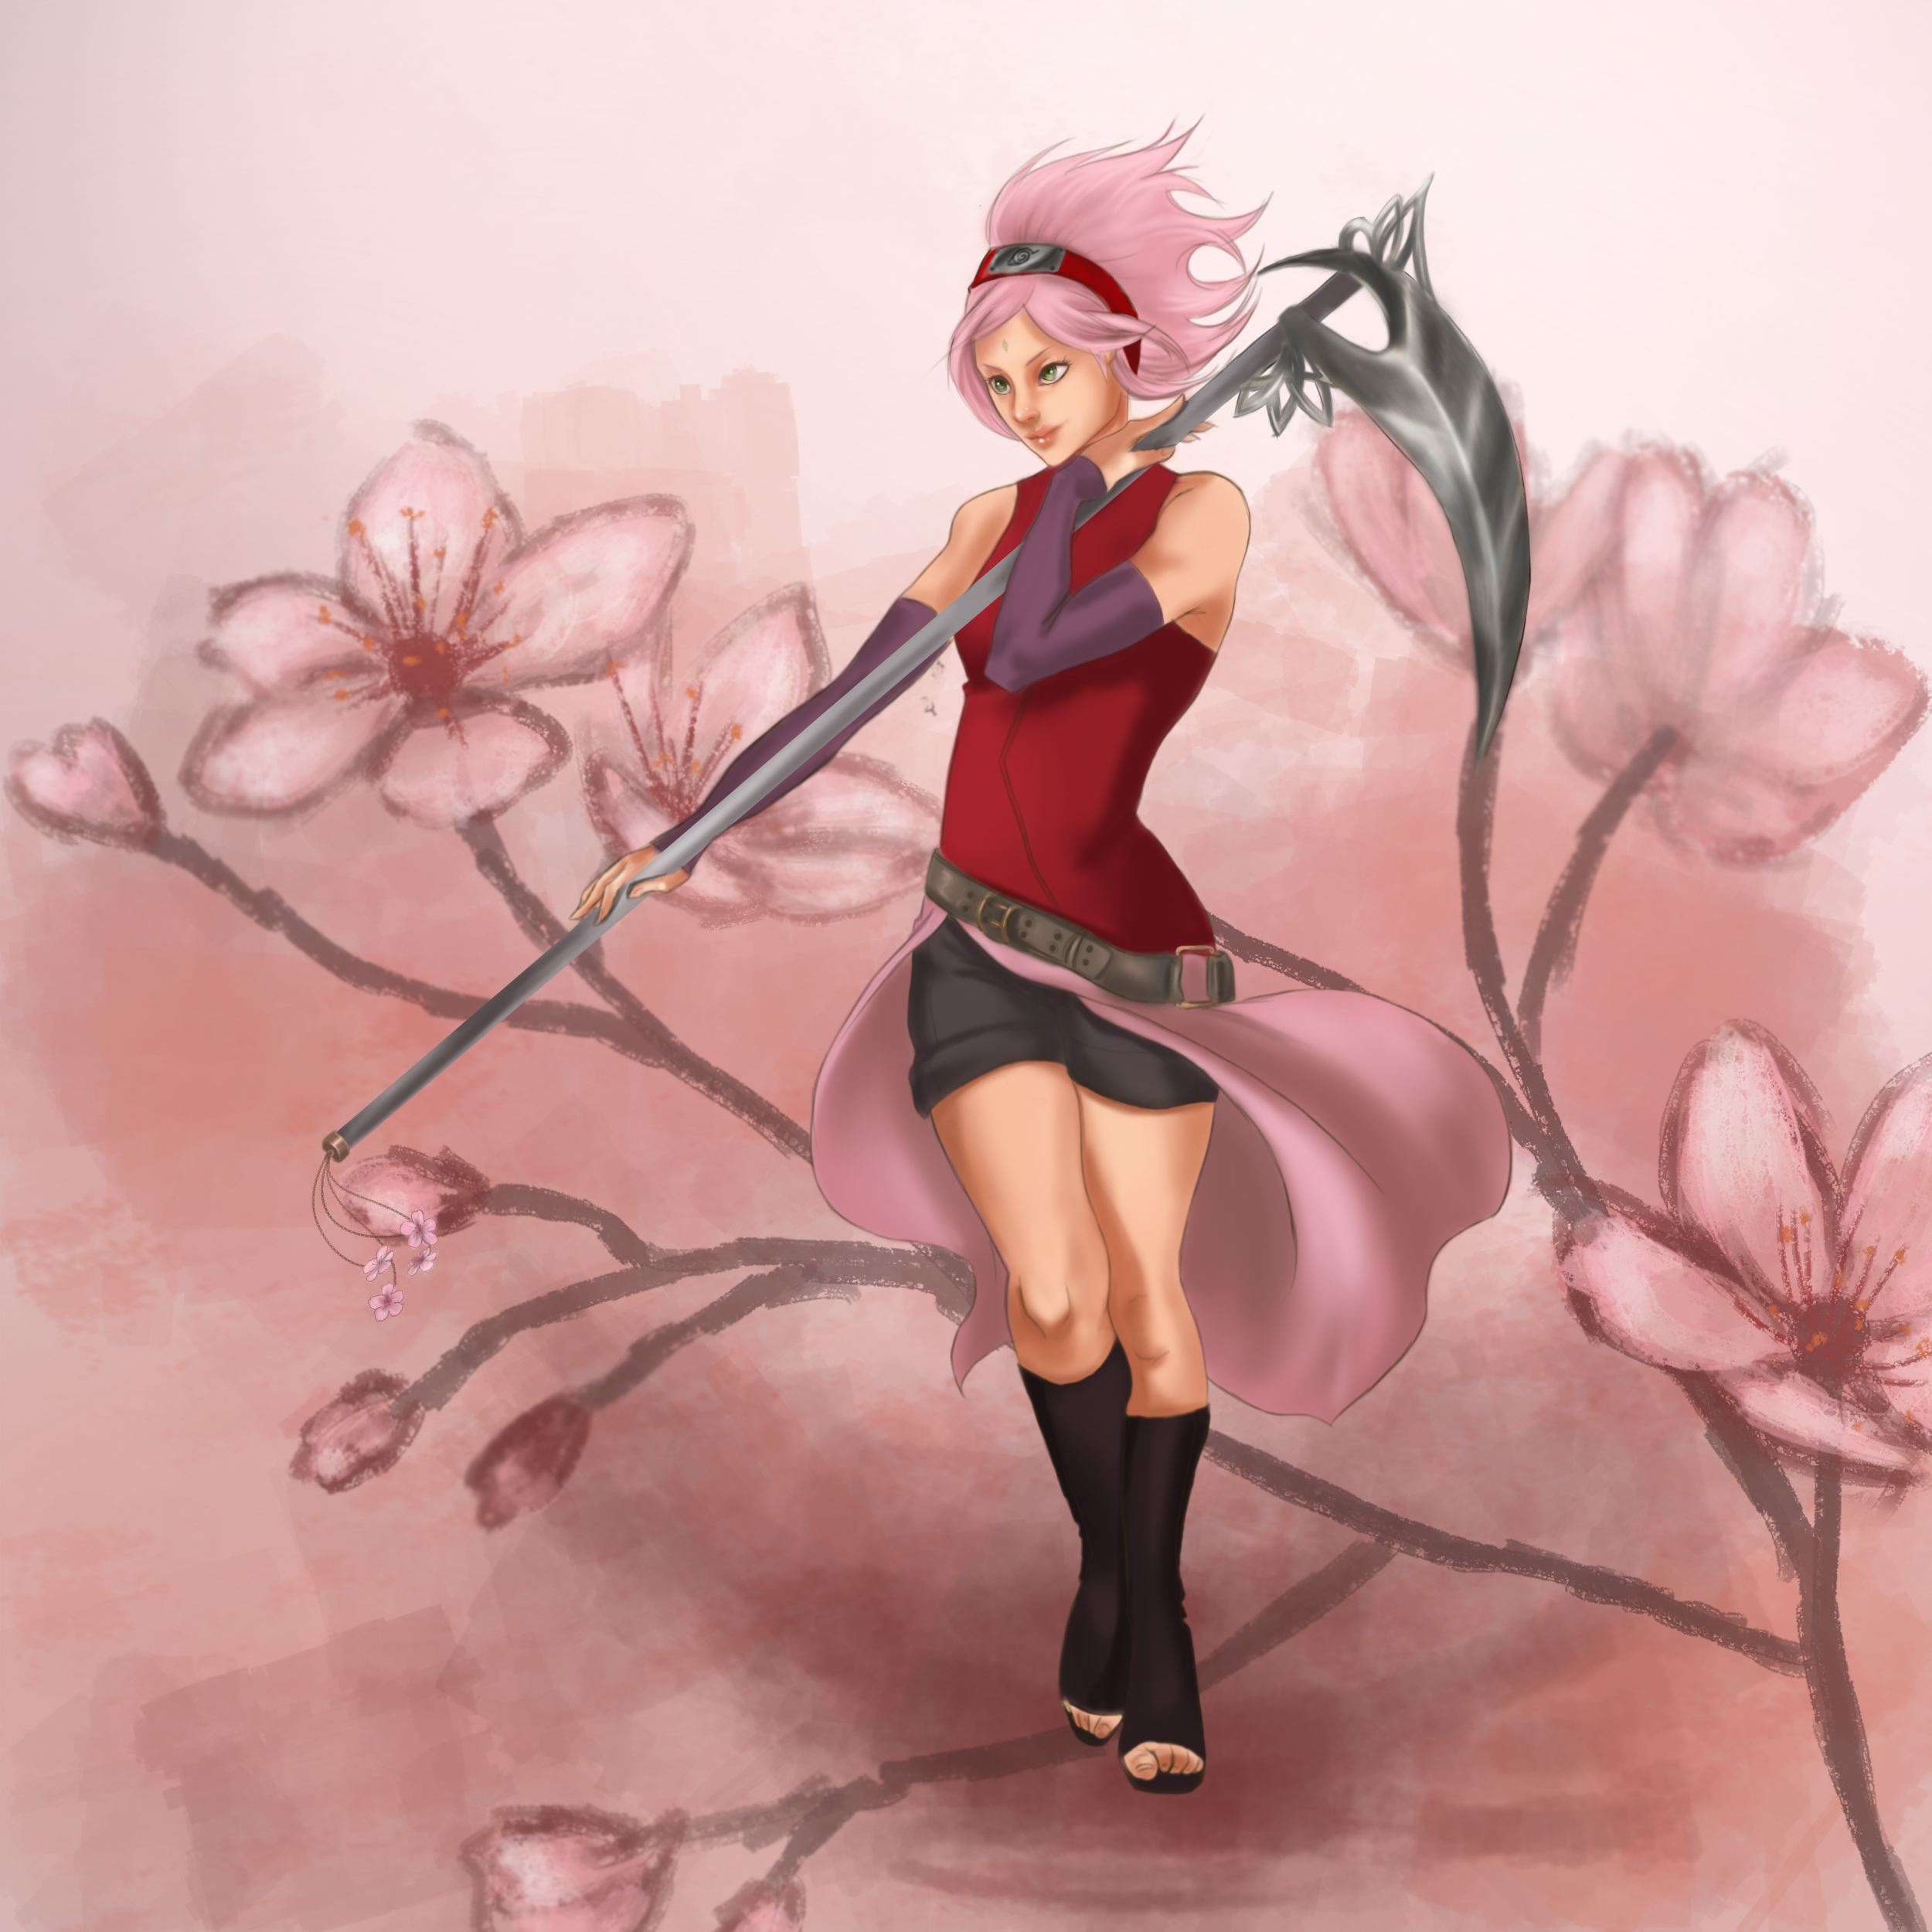 Sakura again.